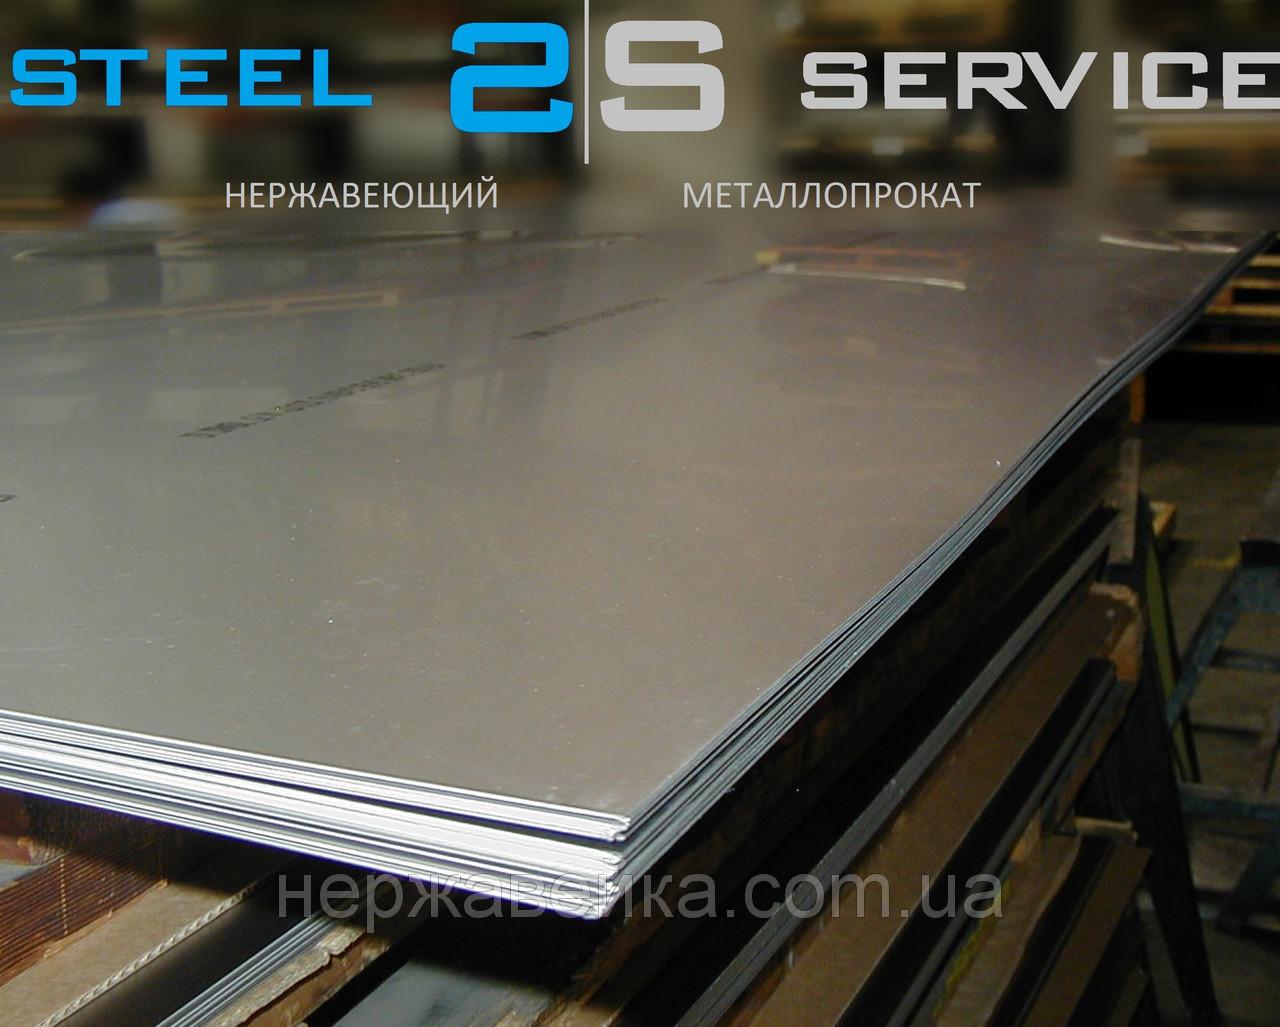 Листовая нержавейка 12х1500х6000мм AISI 430(12Х17) 2B - матовый, технический